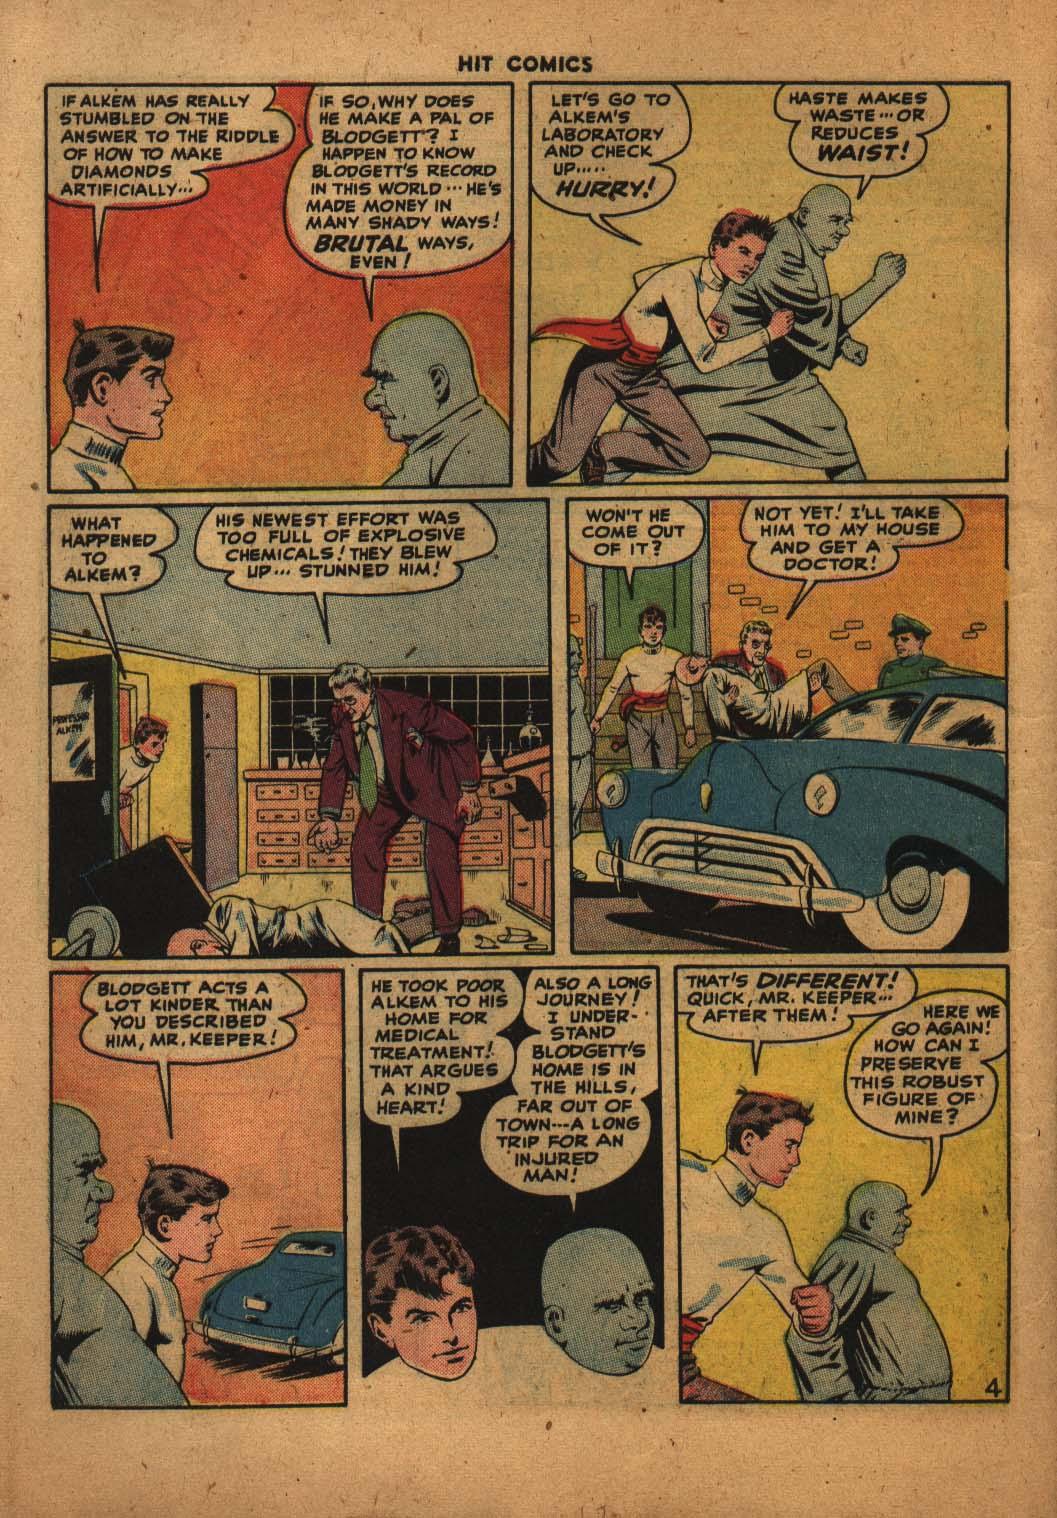 Read online Hit Comics comic -  Issue #47 - 5